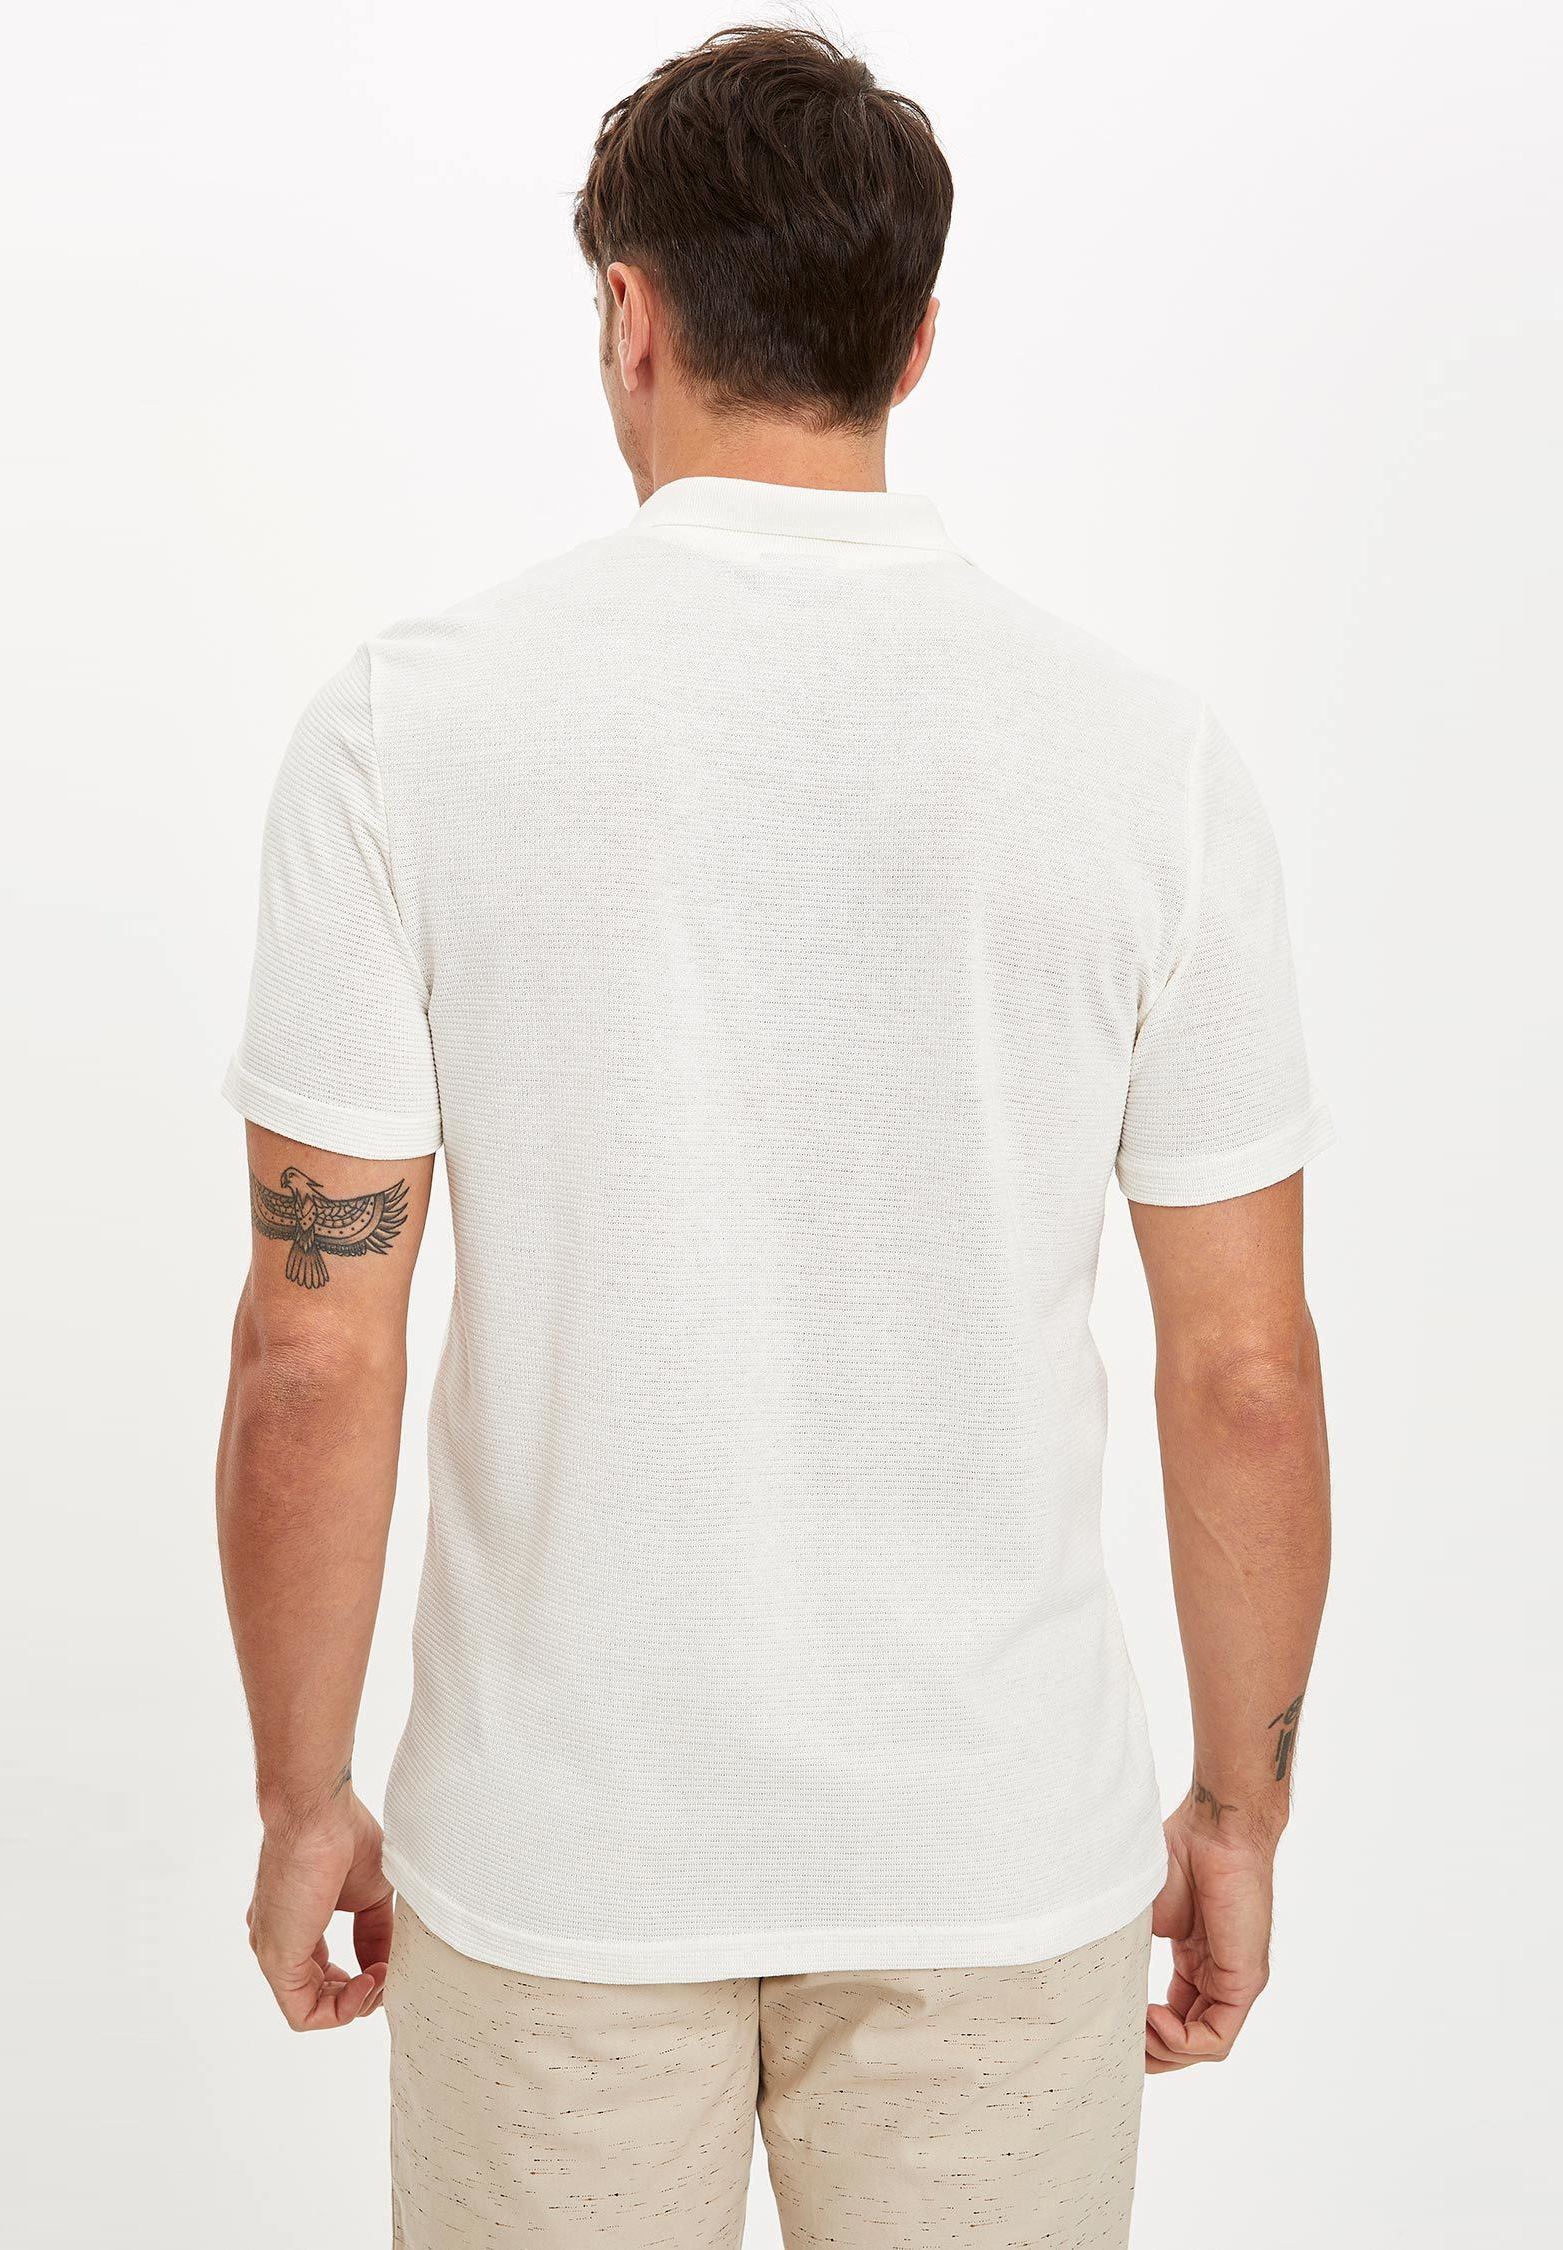 DeFacto Polo shirt - beige ha7yv